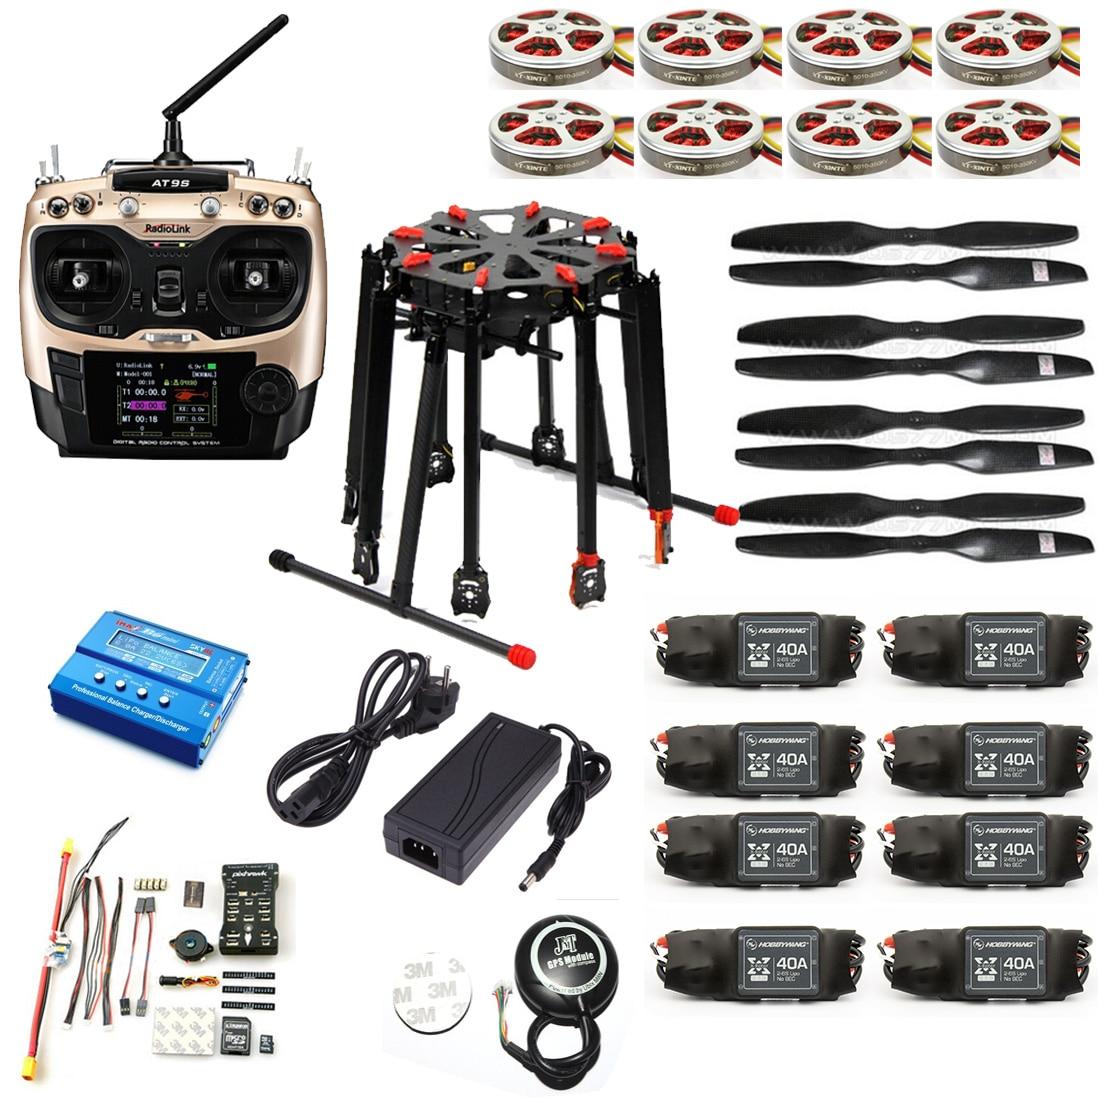 DIY GPS Drone Tarot X8 TL8X000 8-Axis Folding Frame 350KV 40A PX4 32 Bits Flight Controller Radiolink AT9S Transmitter f15441 c apm2 8 flight control with compass 6m gps power distribution board gps folding antenna 5 8g 250mw tx for diy drone